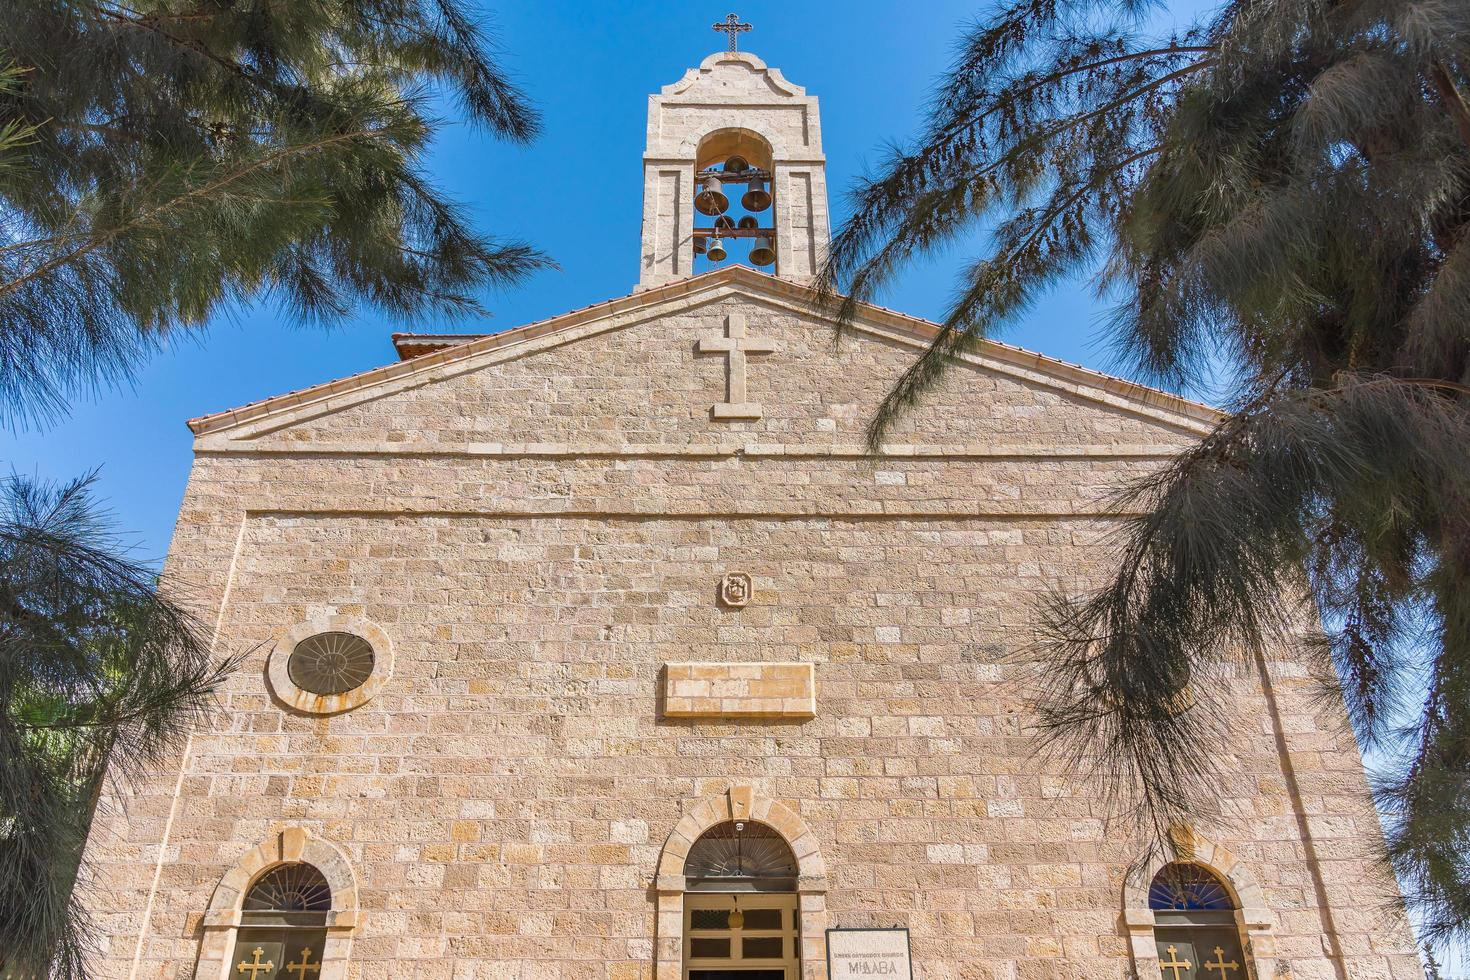 st. george's church a madaba in giordania foto